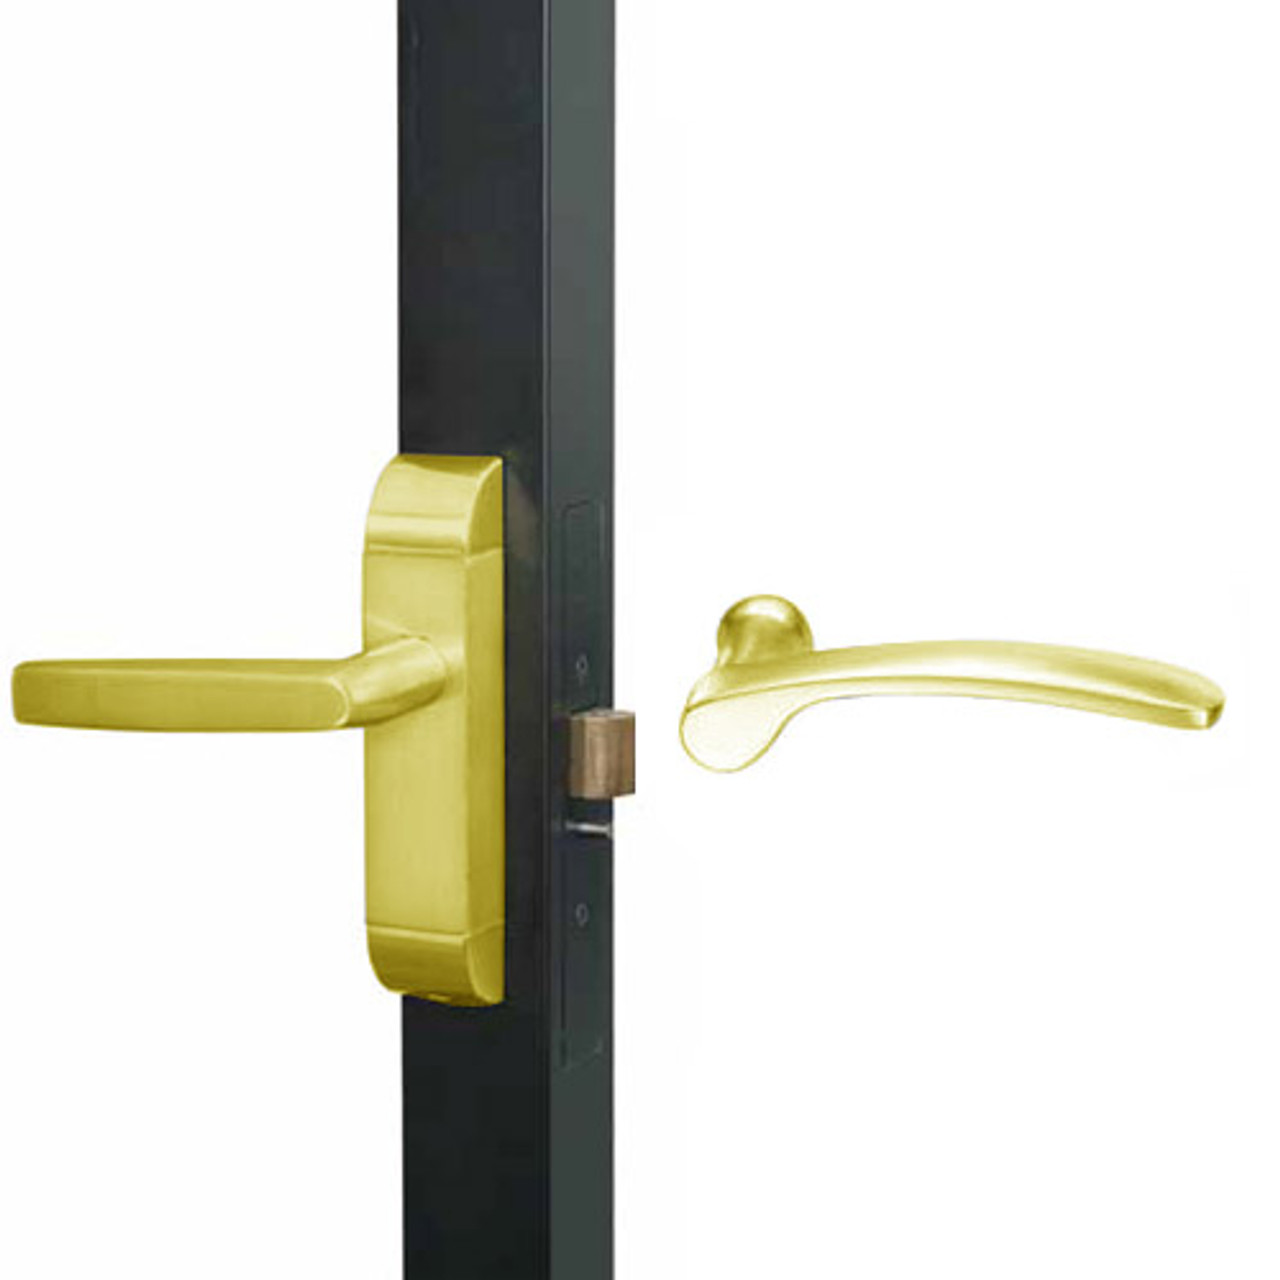 4600-MN-511-US3 Adams Rite MN Designer Deadlatch handle in Bright Brass Finish